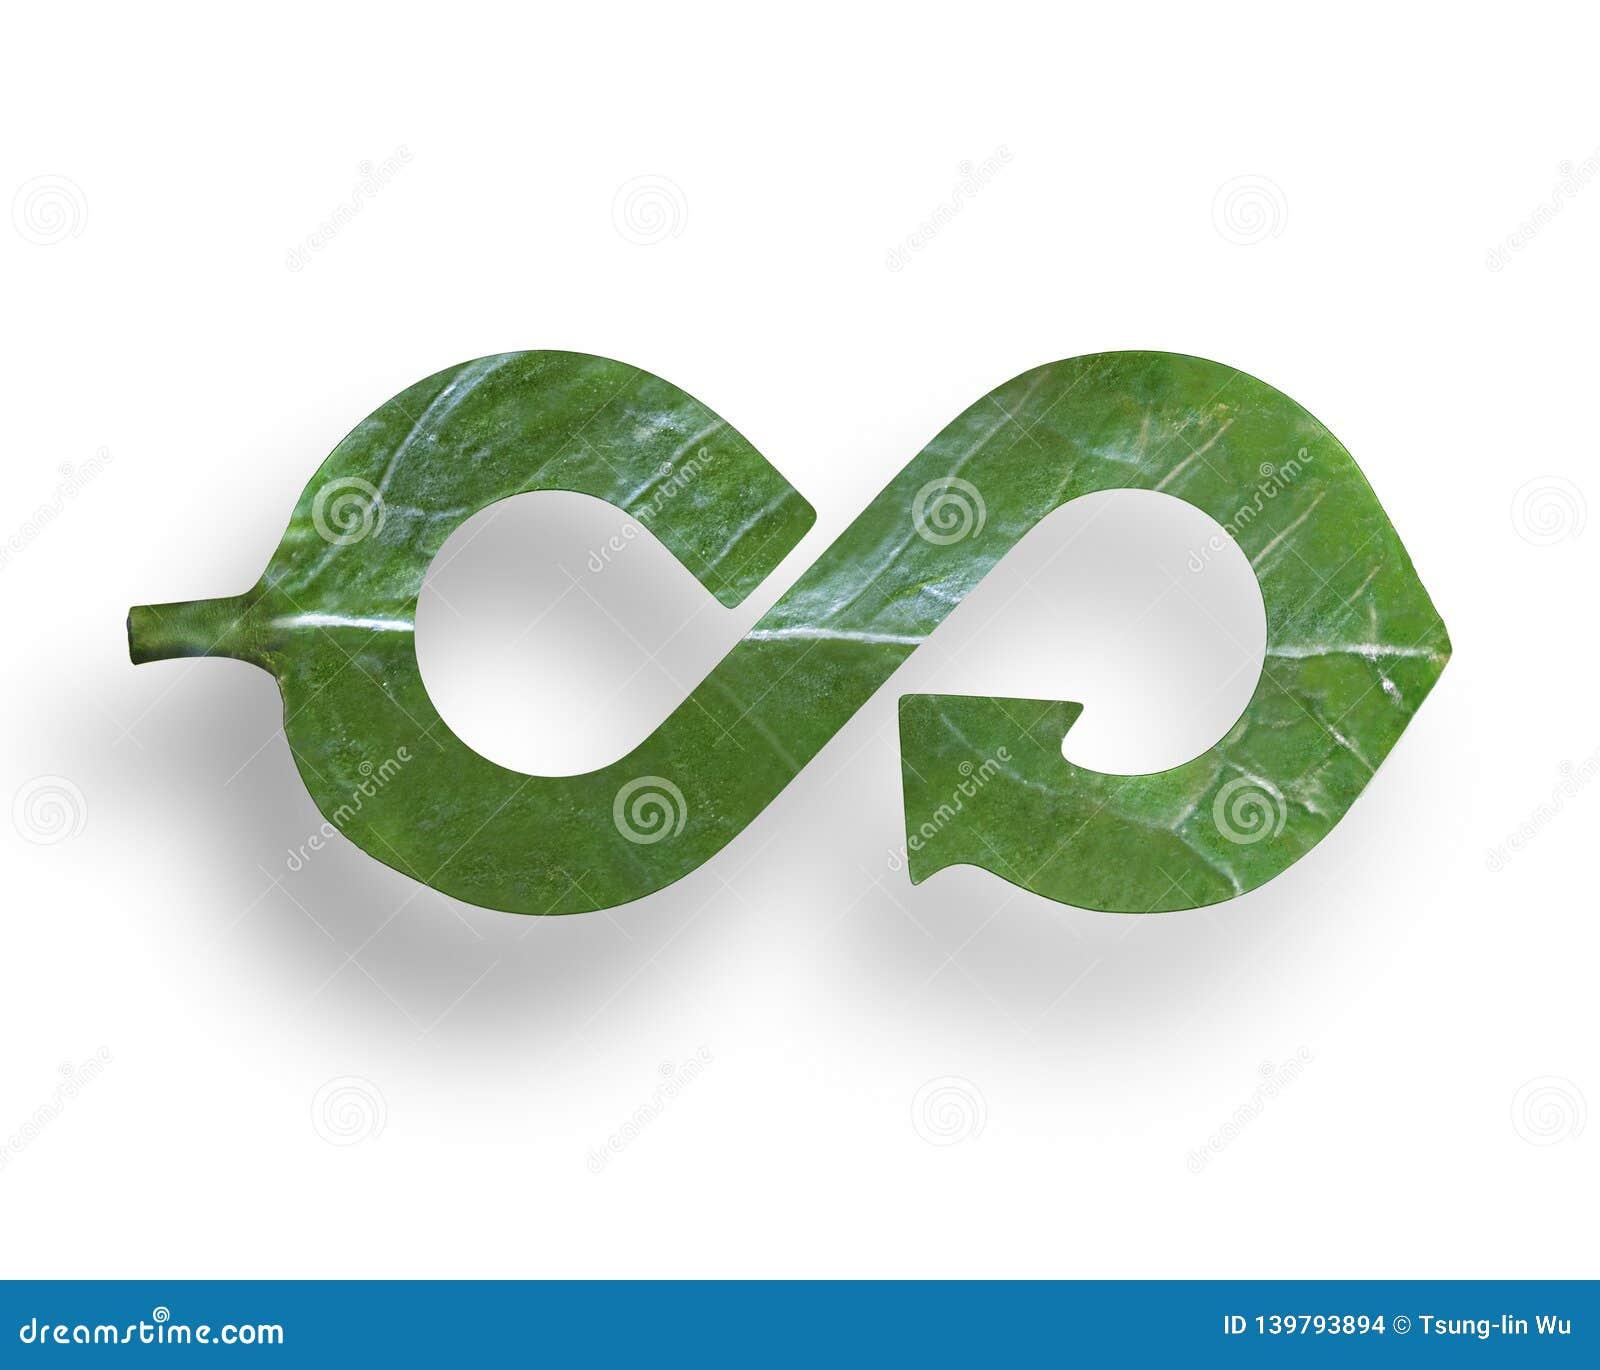 Leaf in form of arrow infinity recycling shape, circular economy